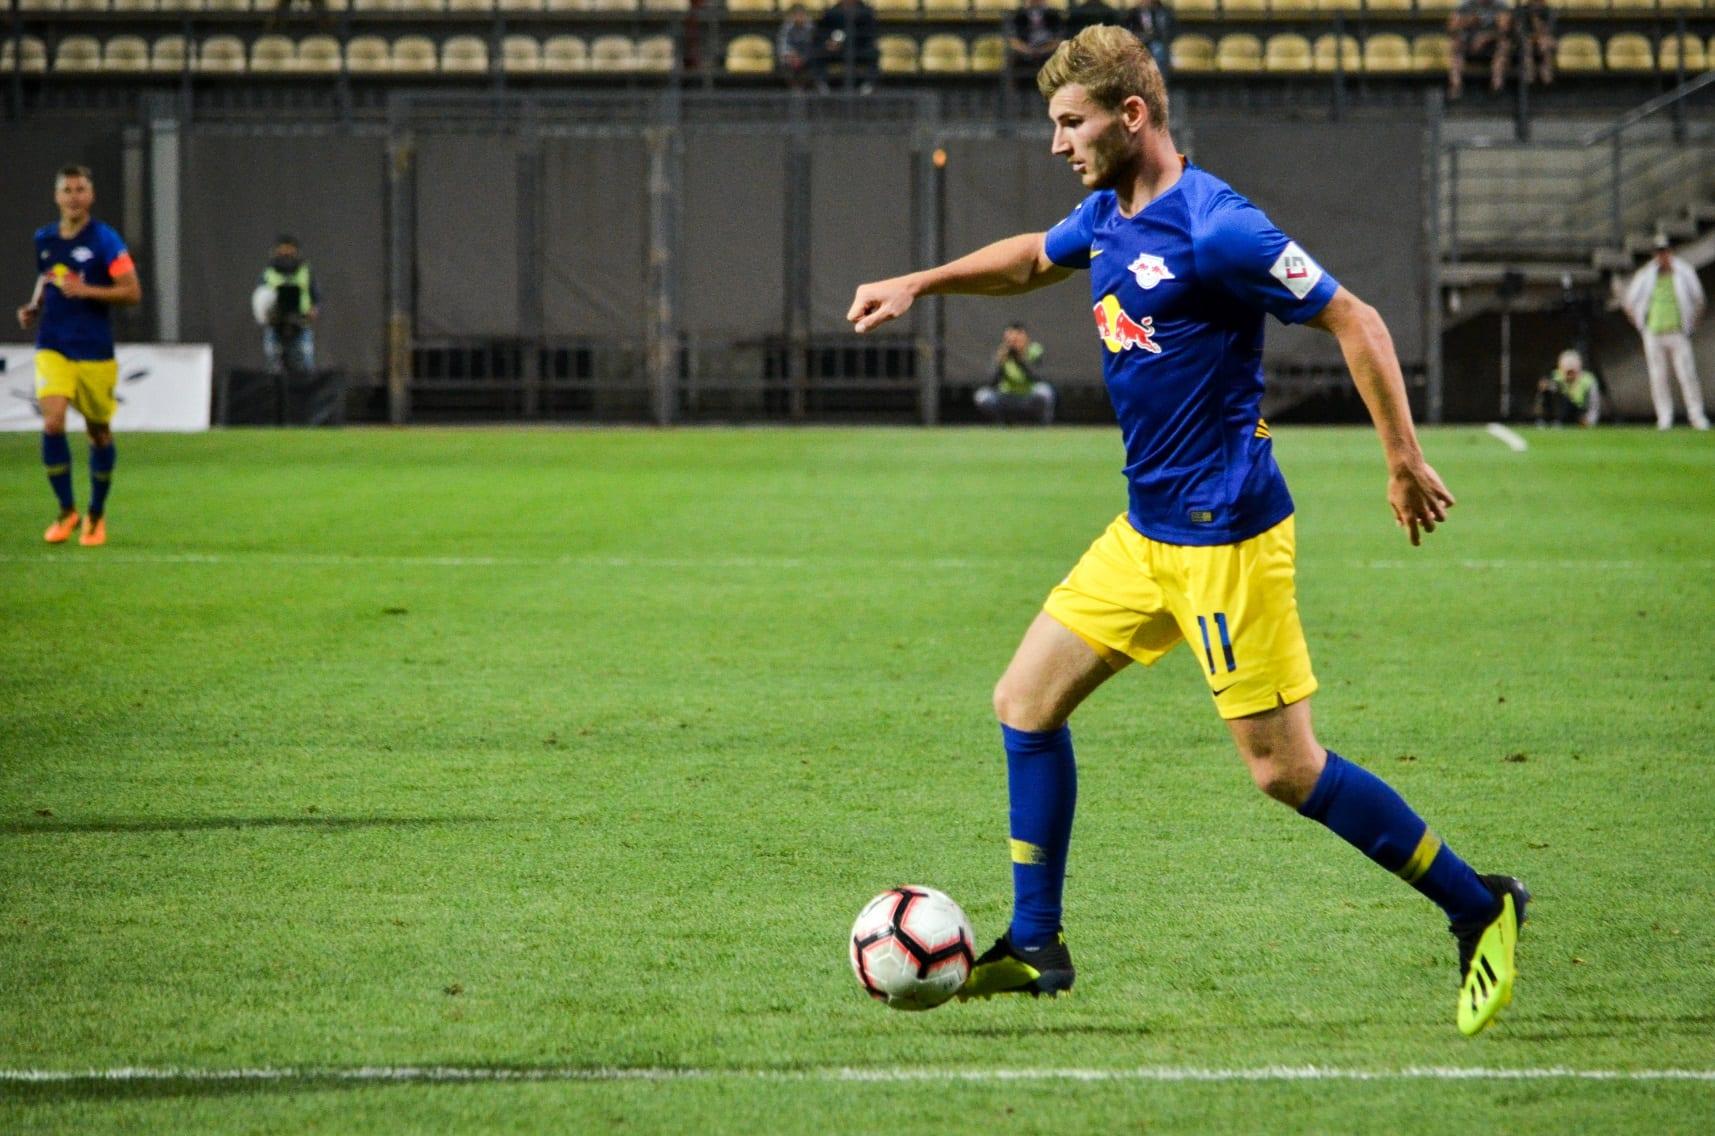 Timo Wernder z piłką